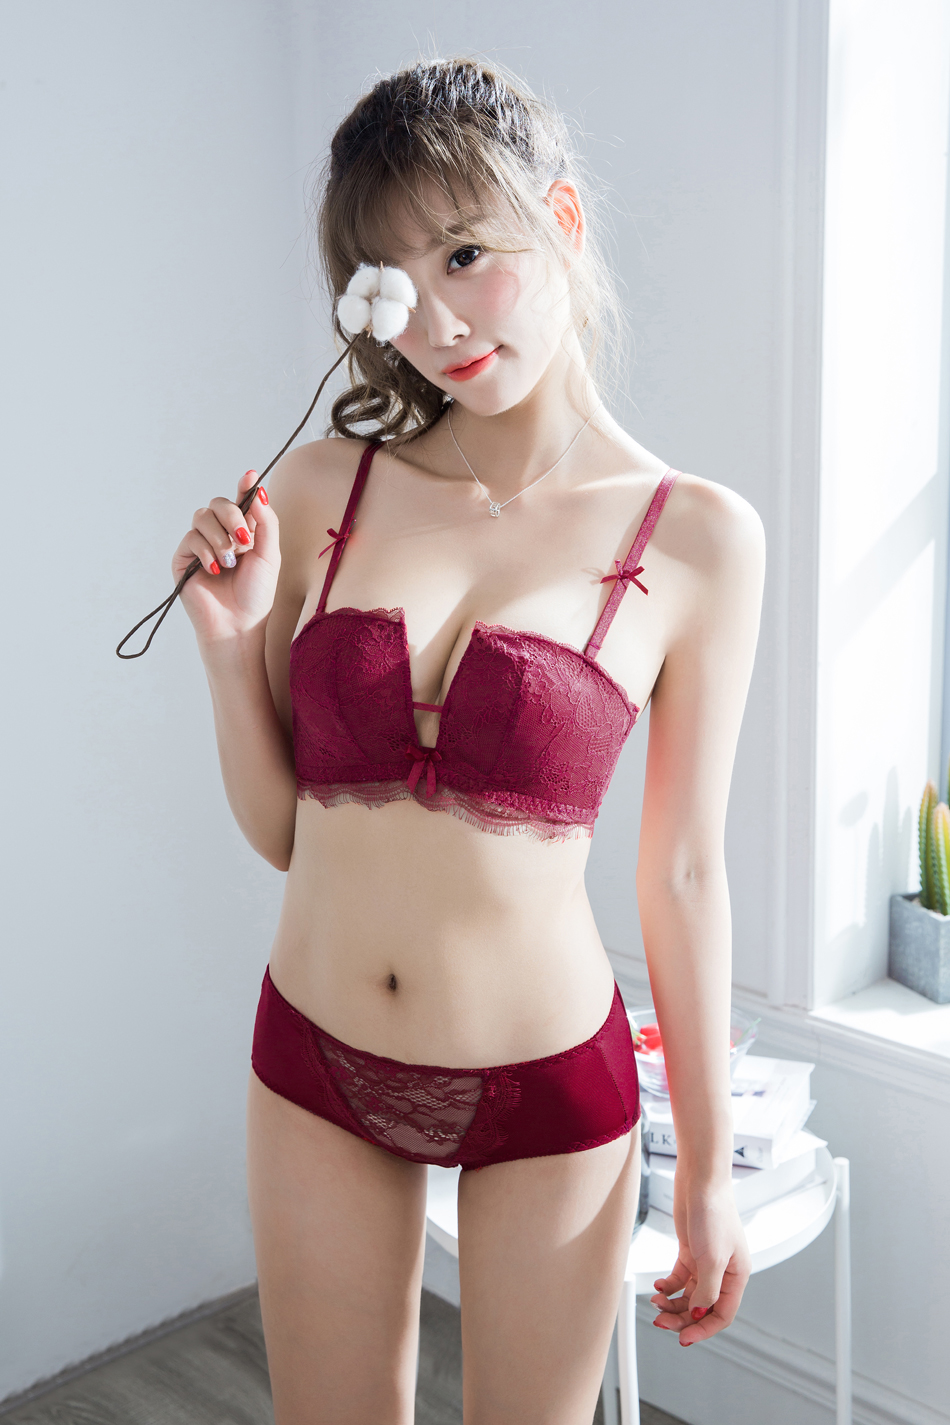 c223c490e91 Japanese embroidery intimates push up bra set sexy transparent bra lace  women underwear lingerie bra   brief sets PINKUSD 15.89 set